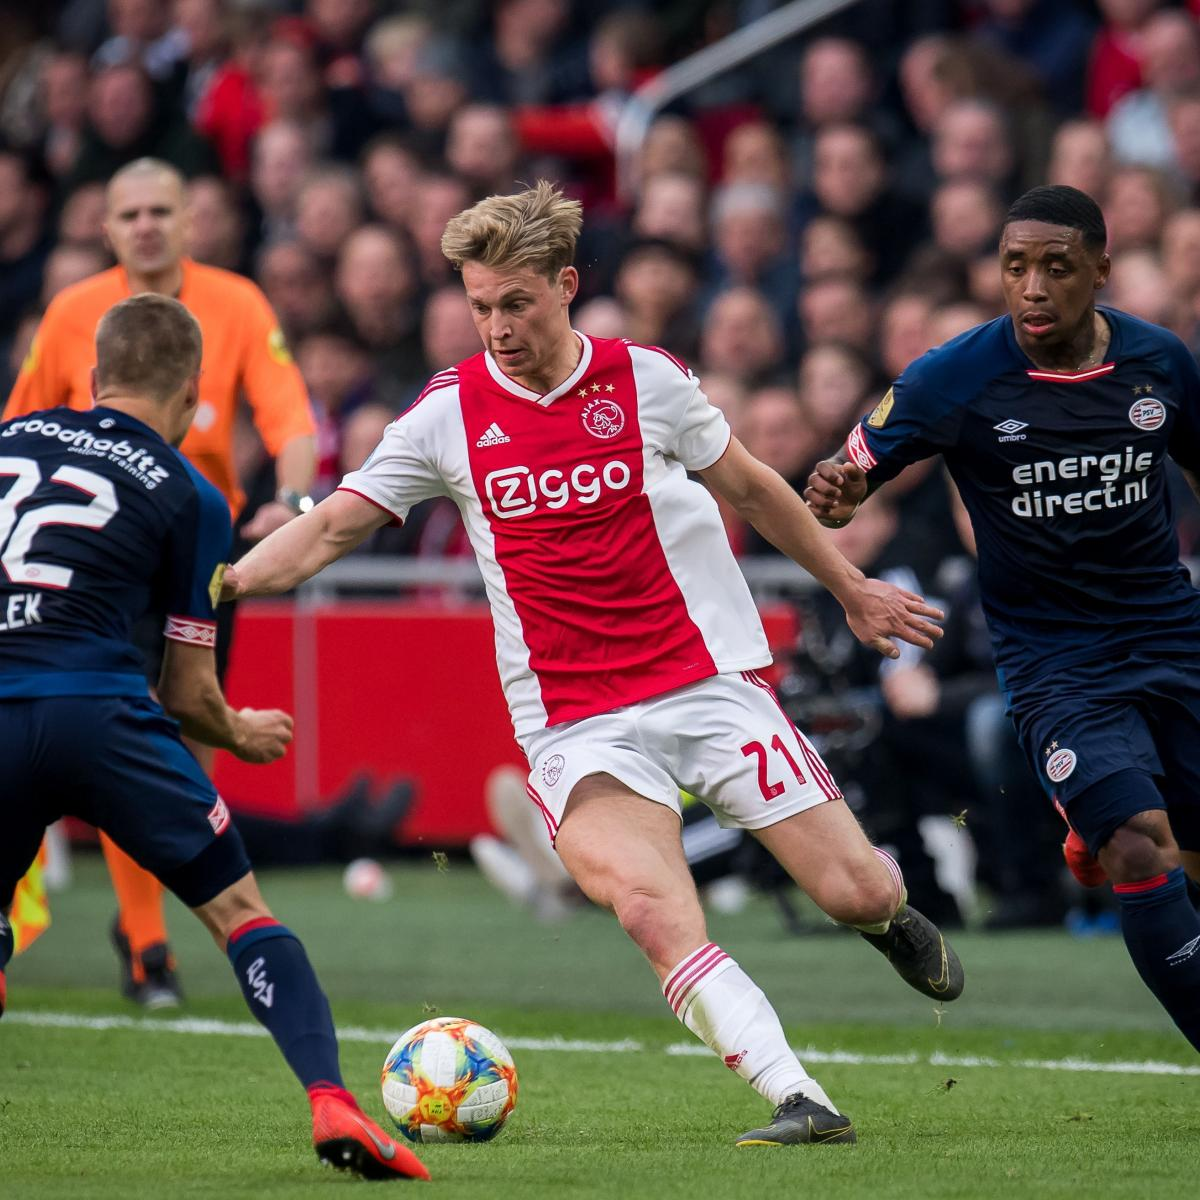 Ajax's Frenkie De Jong Confirms He Snubbed Approach From